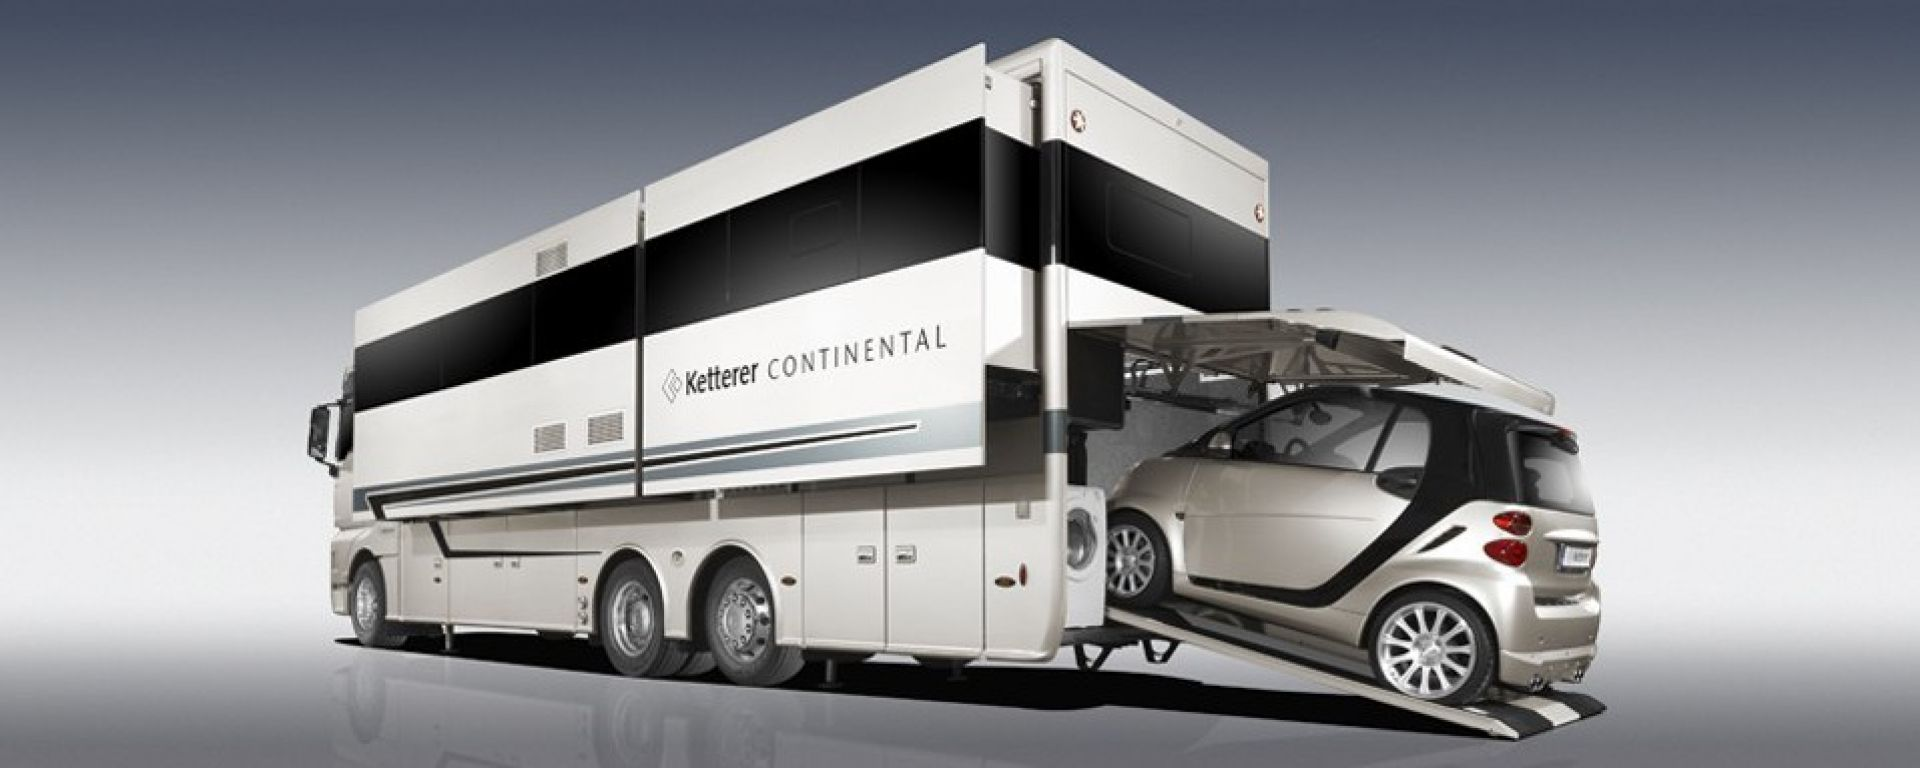 motorhome ketterer continental motorbox